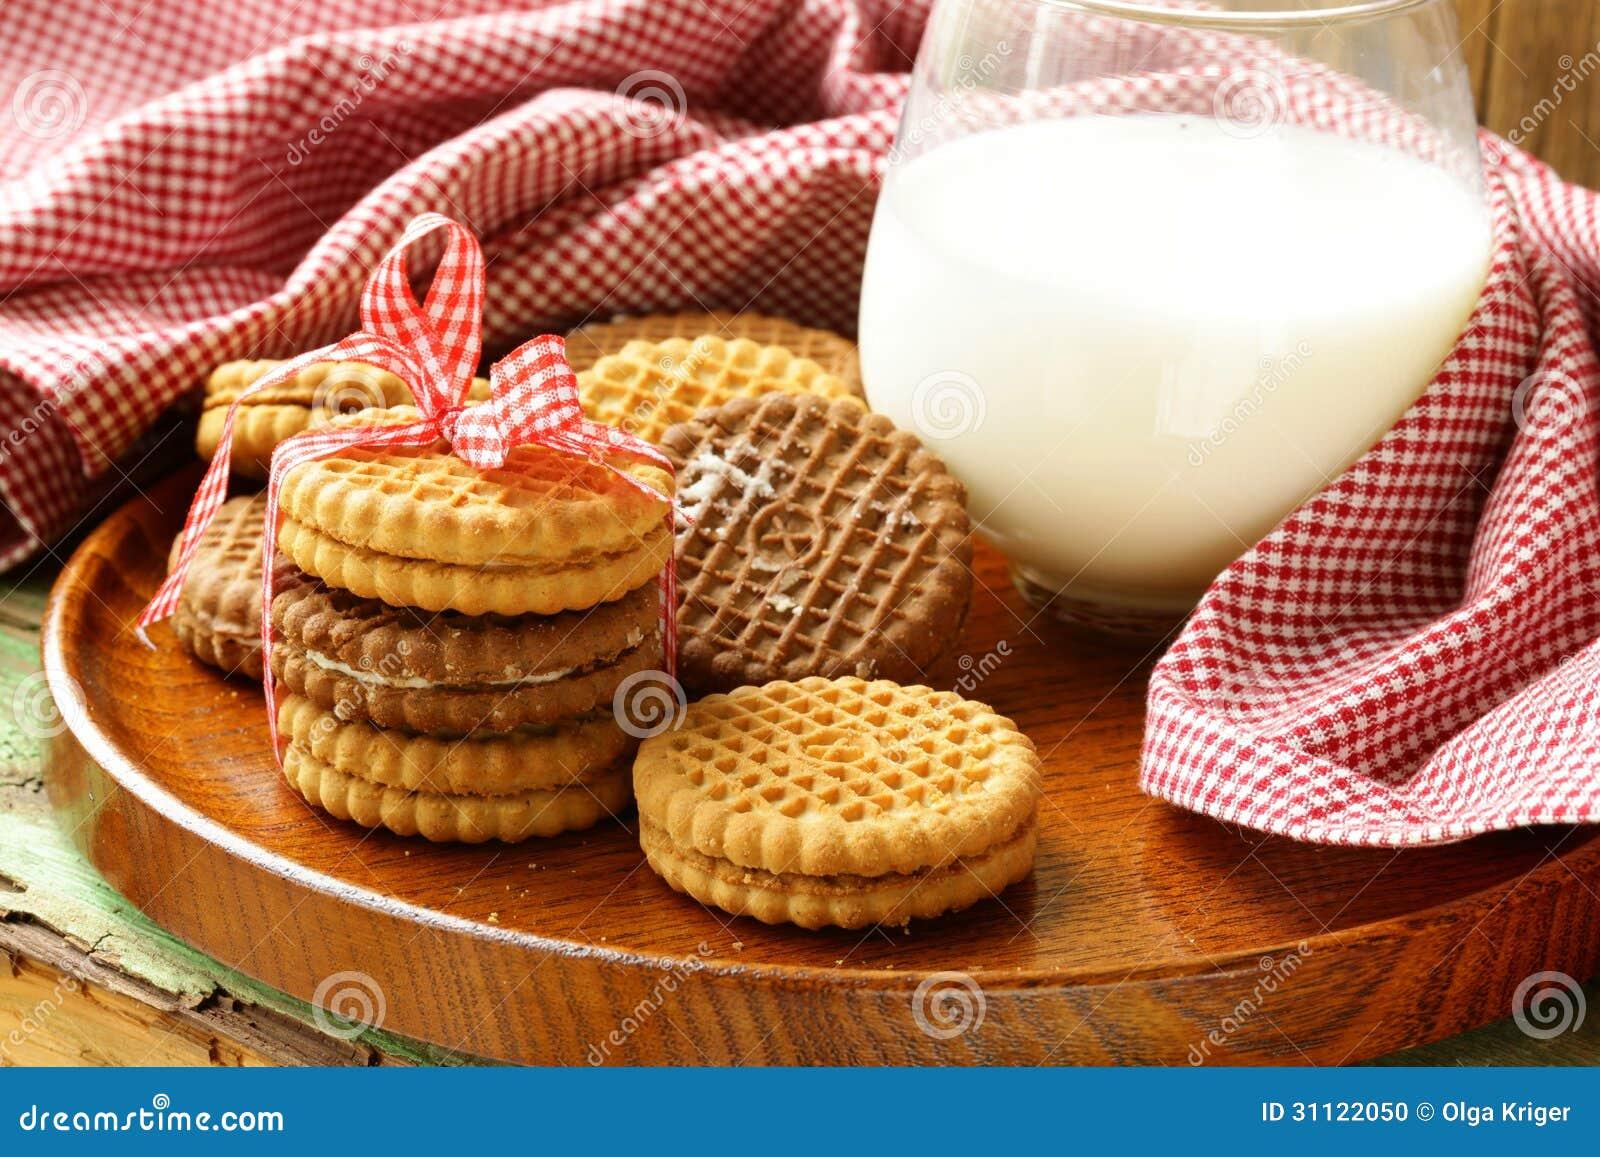 Galletas hechas en casa (bocadillo) con leche